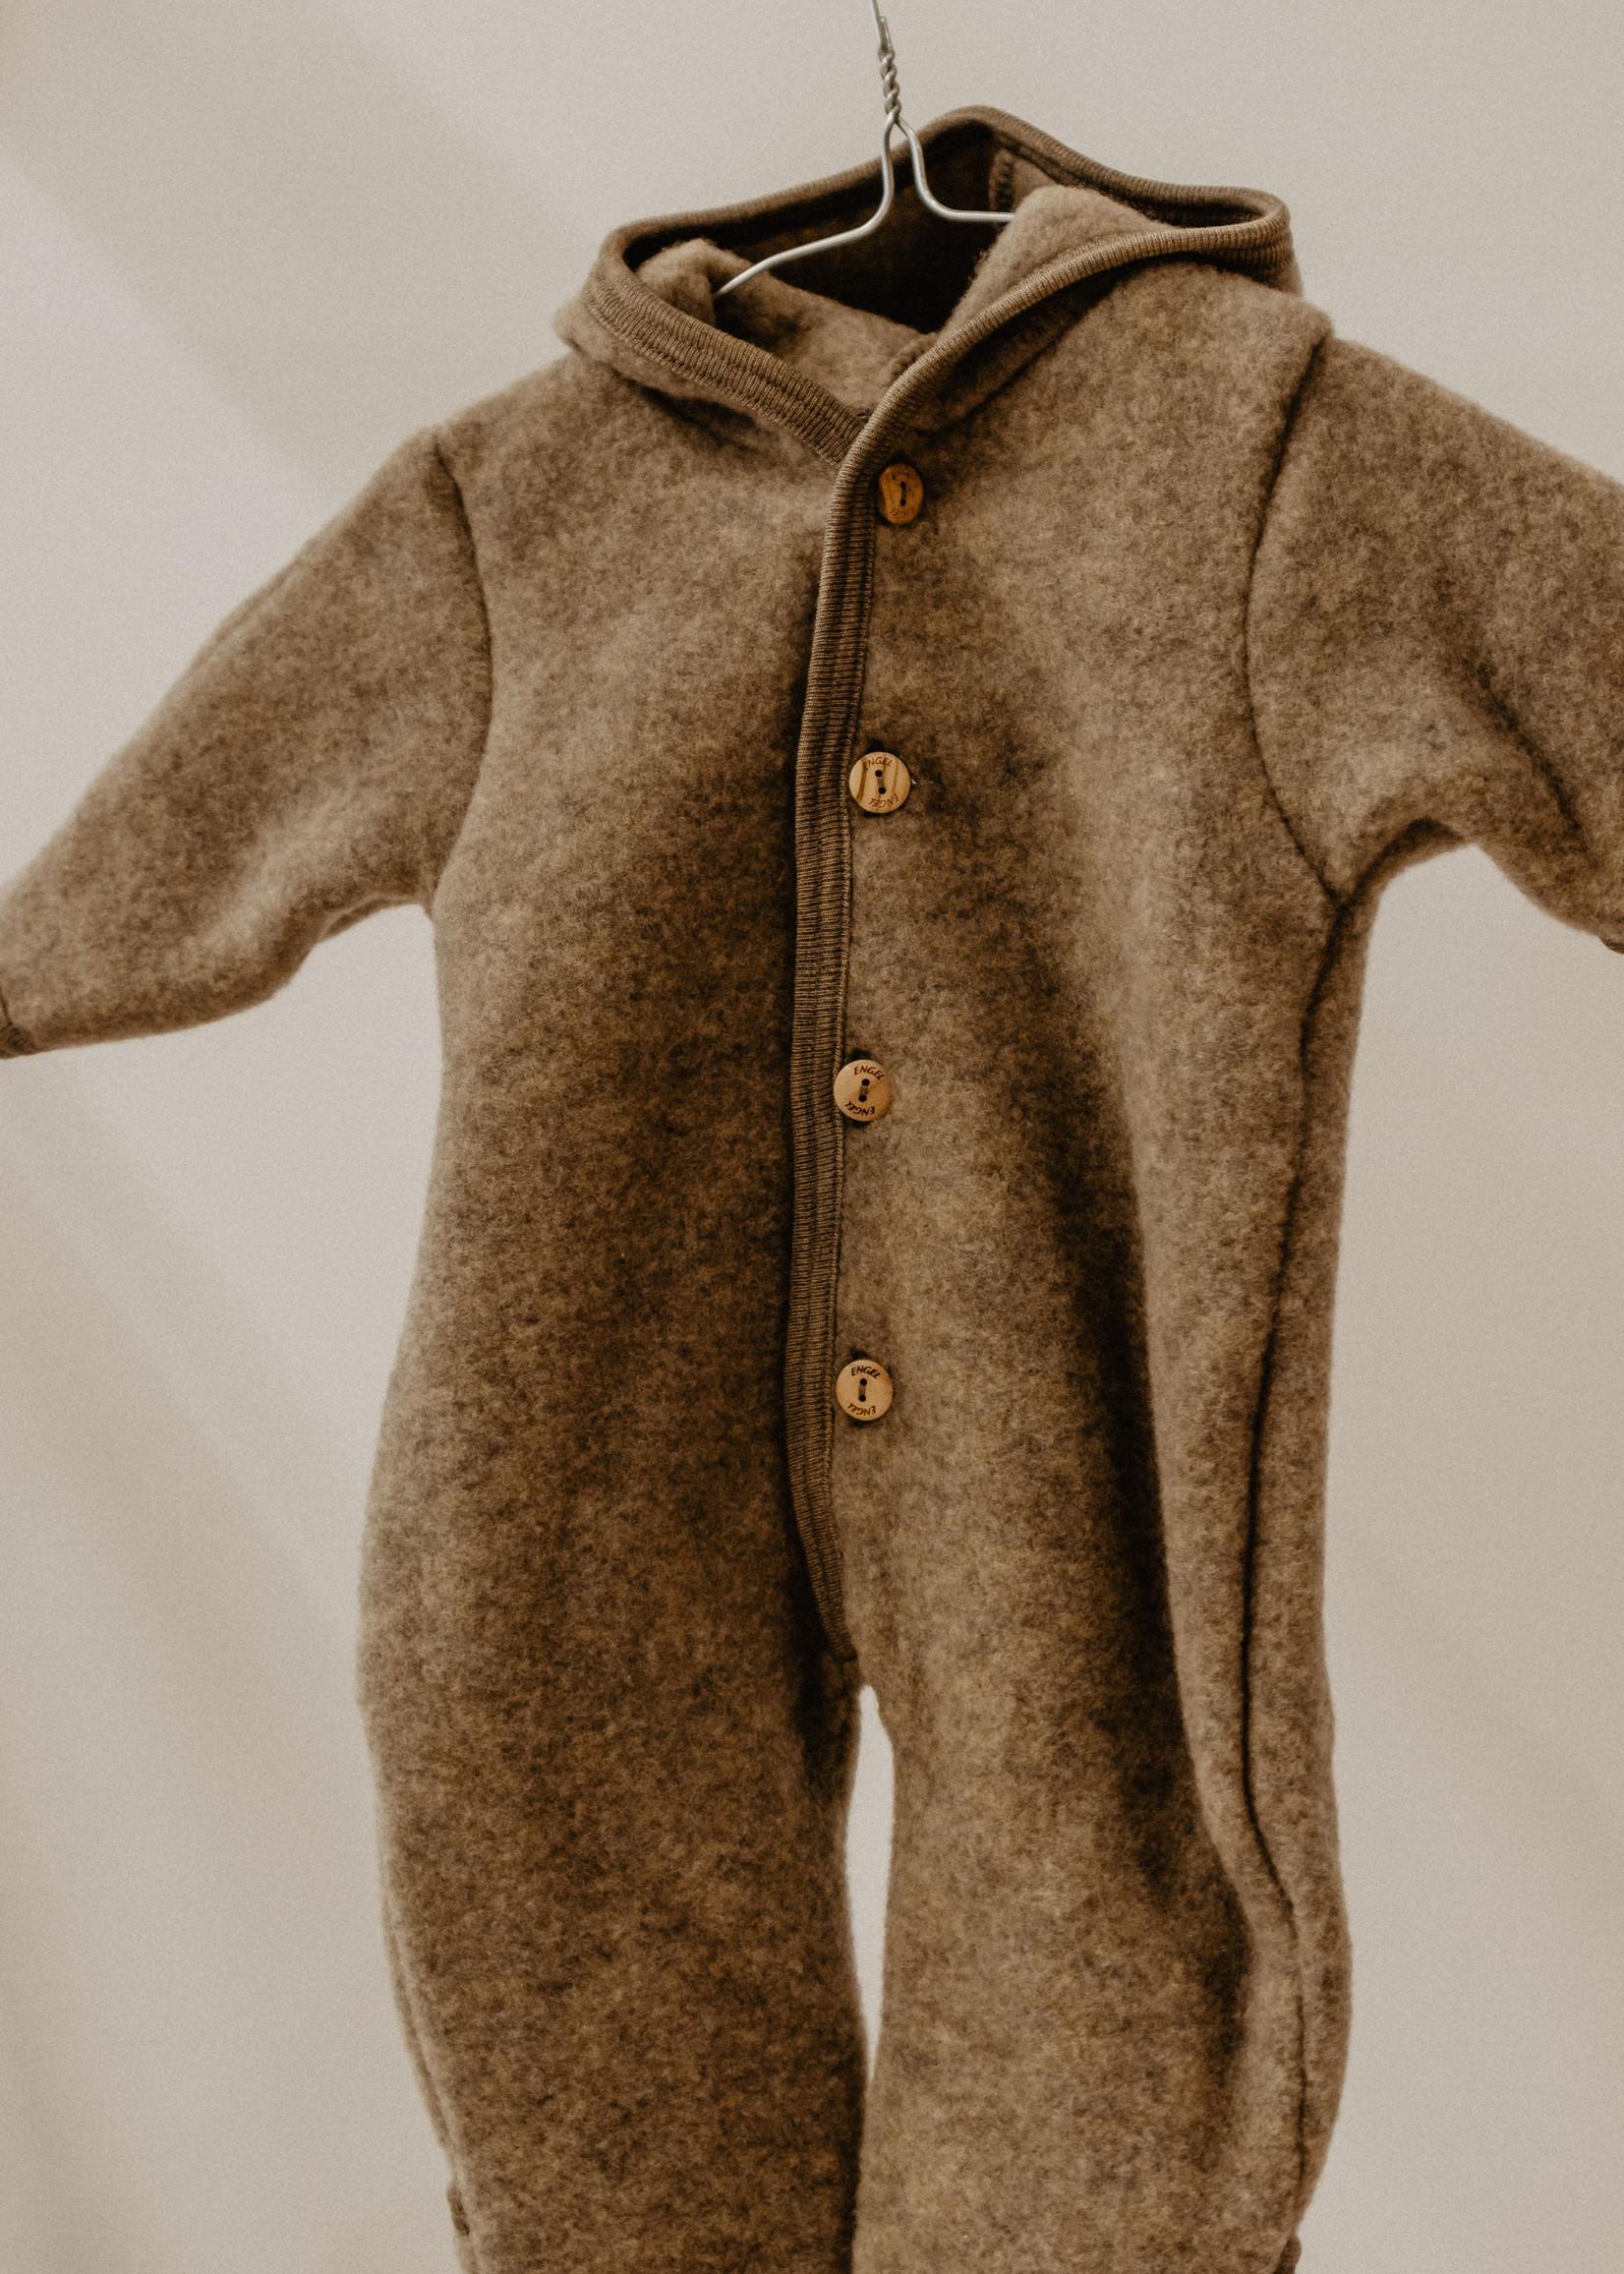 Engel Hooded Overall - Walnut